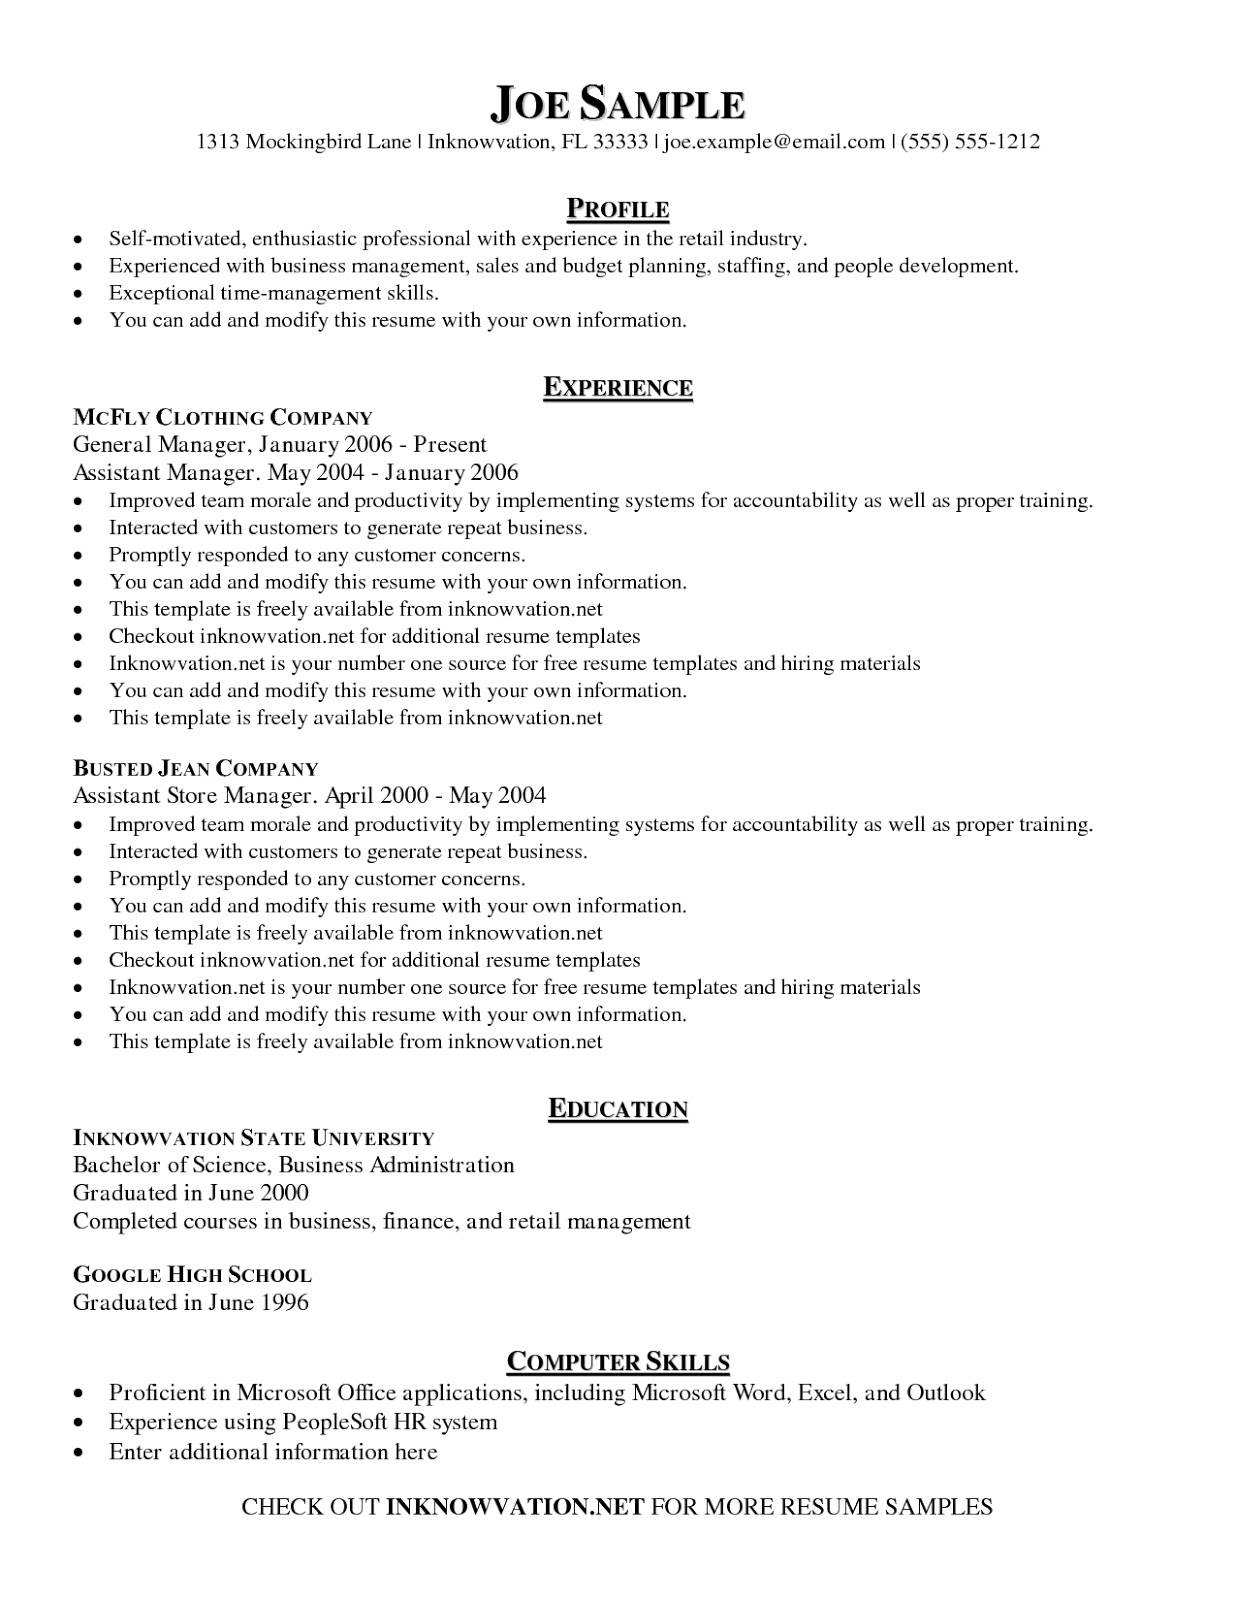 resume template design ideas 2017 free dadakan